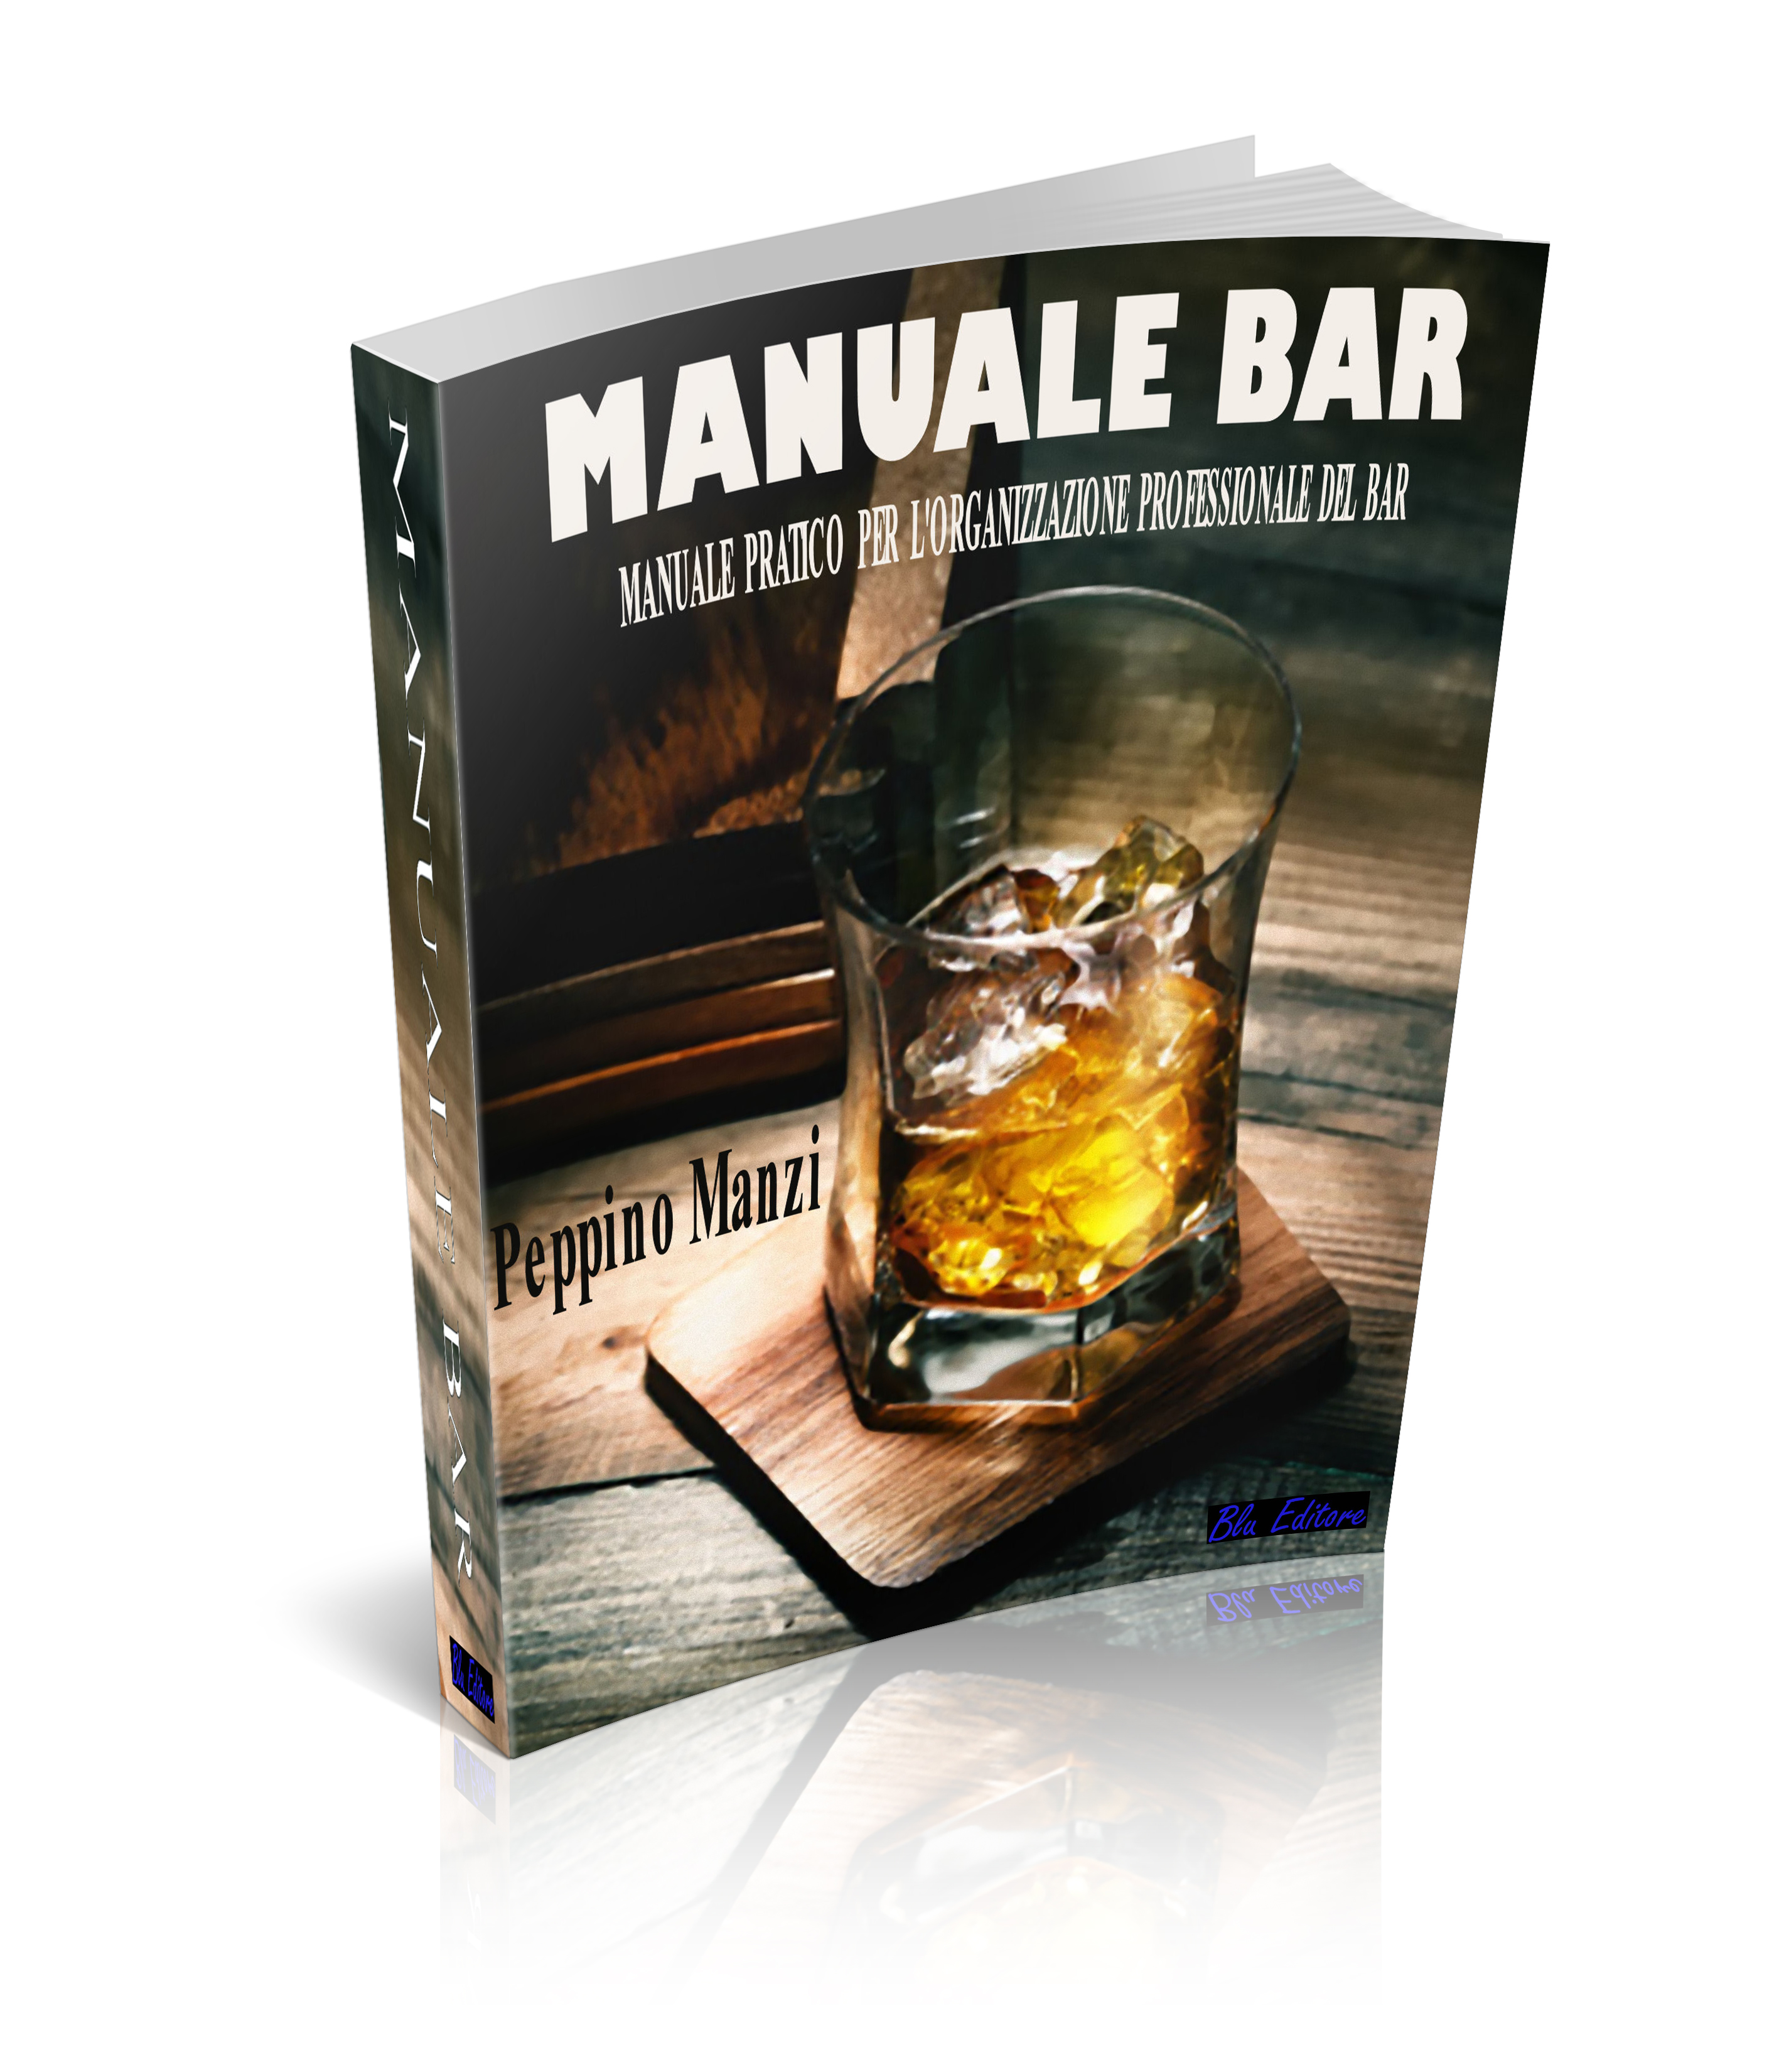 Manuale Bar